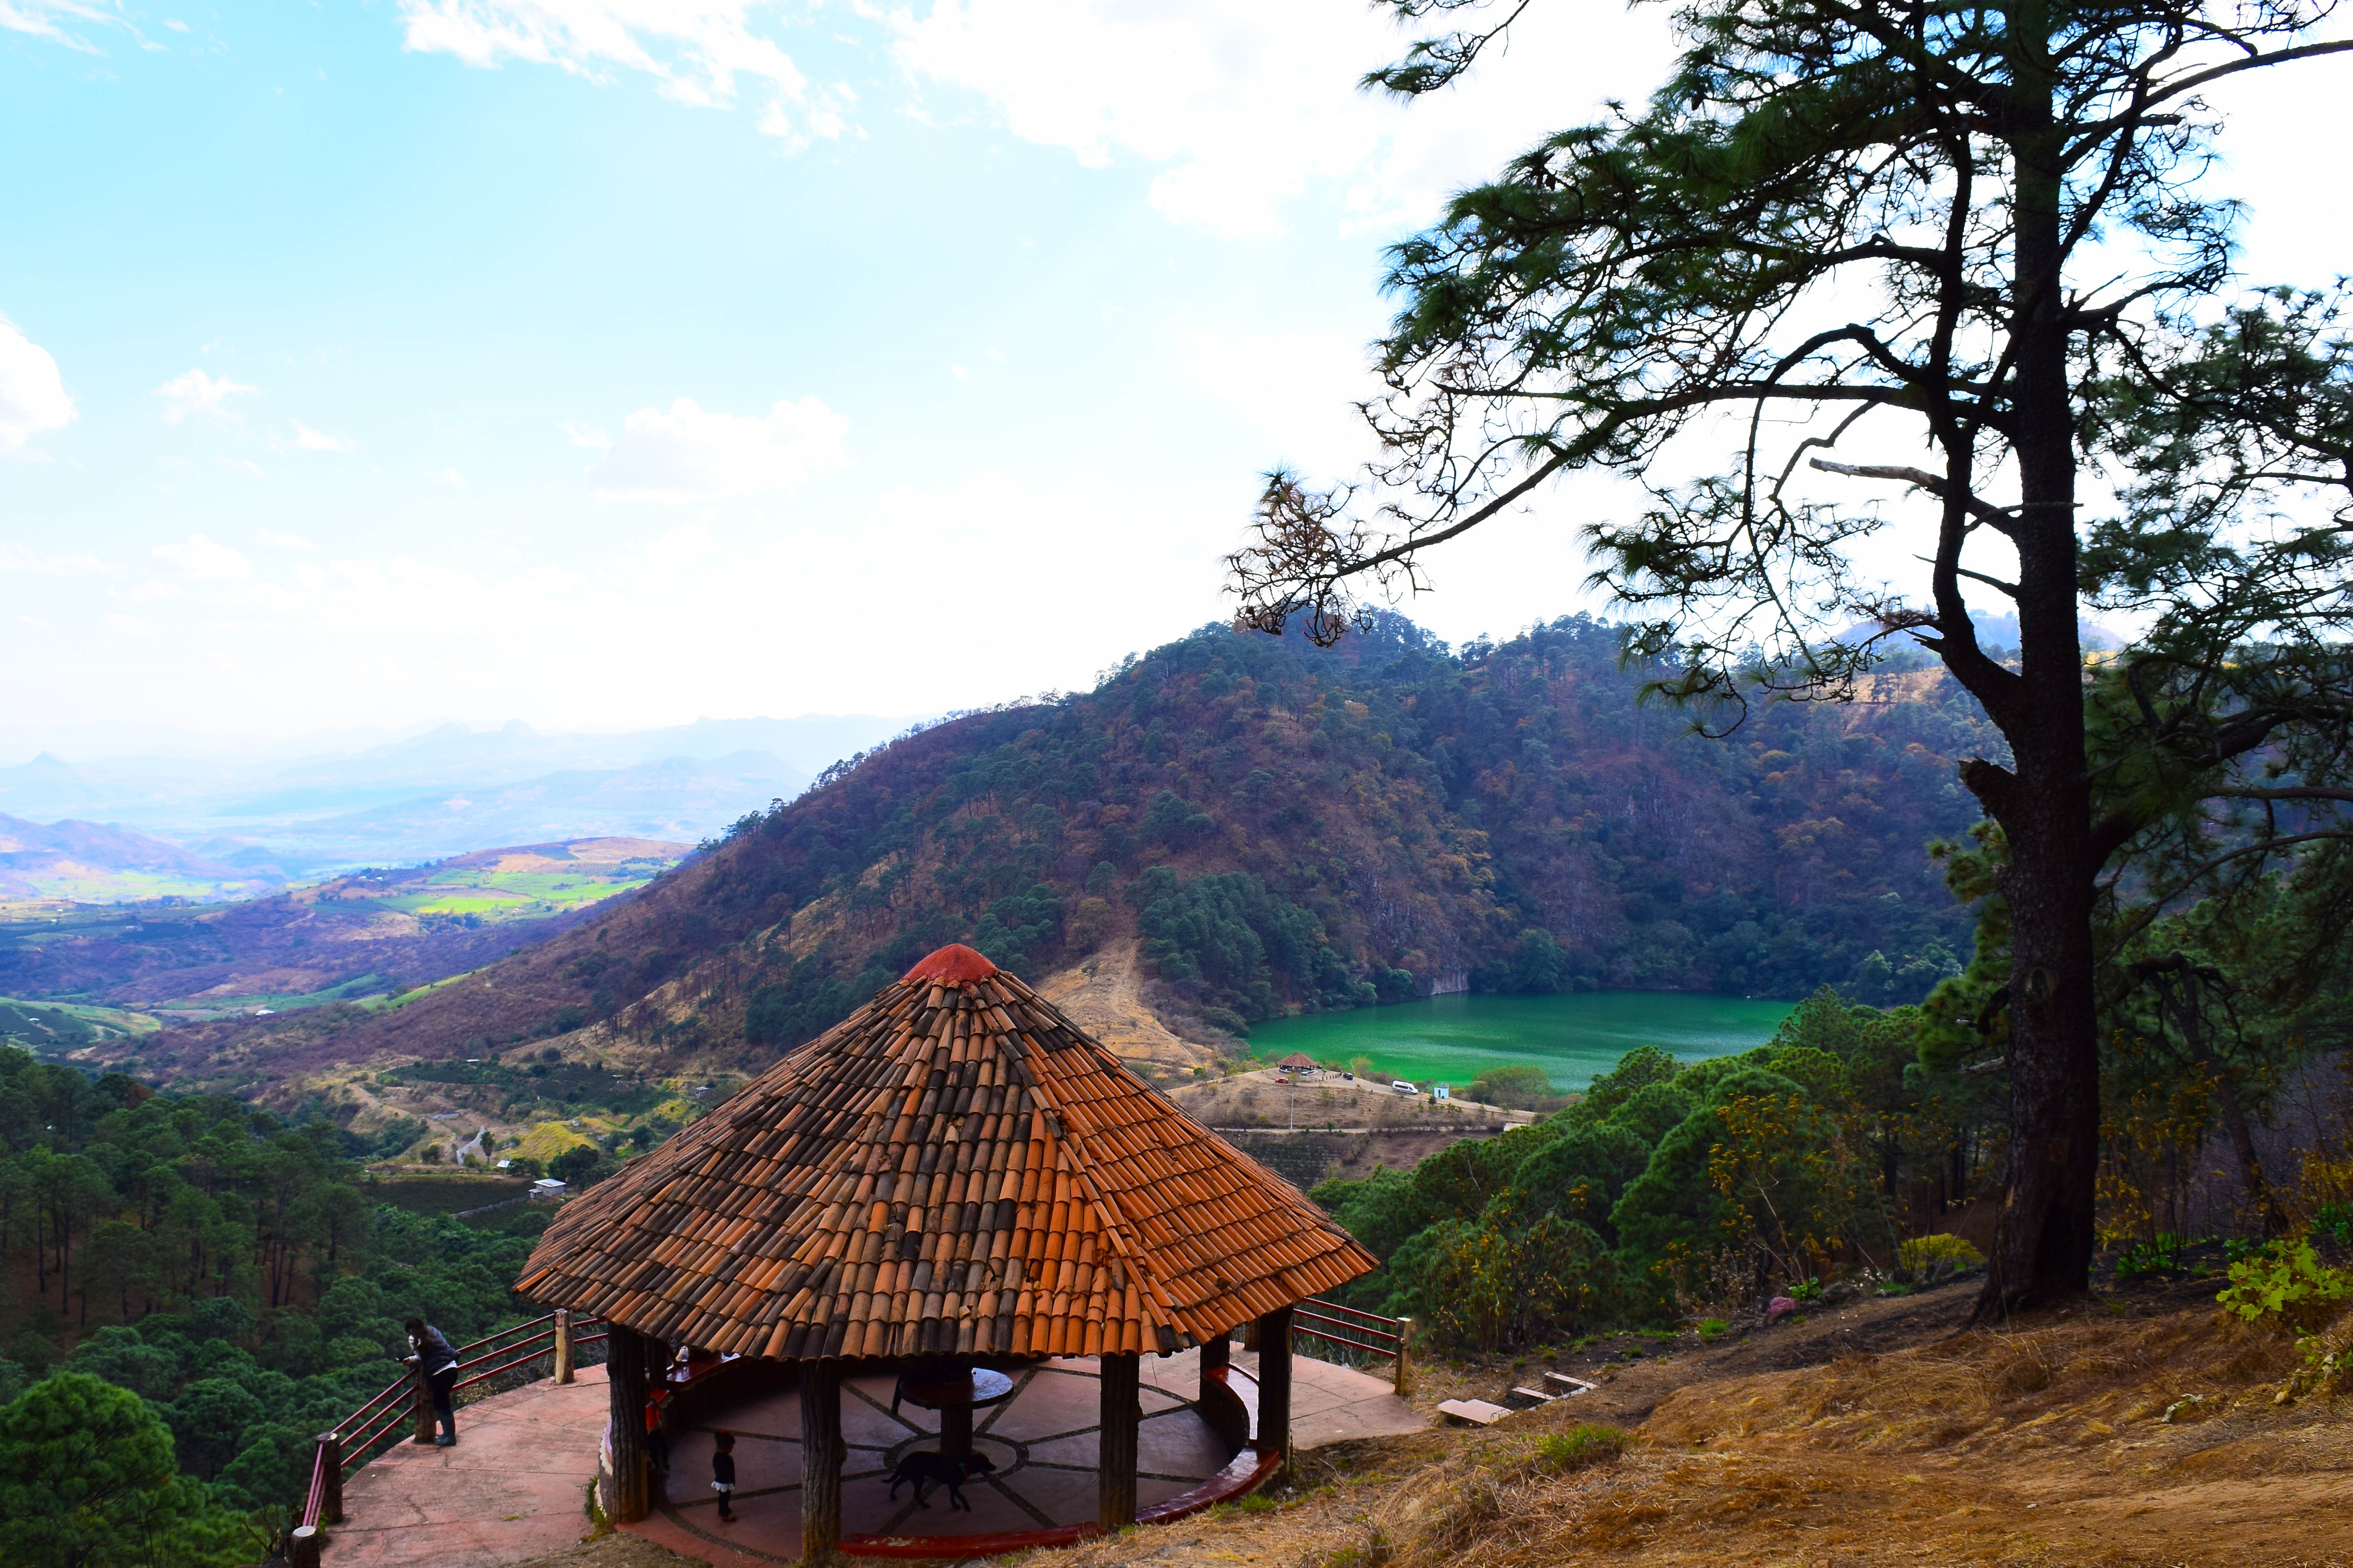 Parque Recreativo Ecológico Cerro Hu